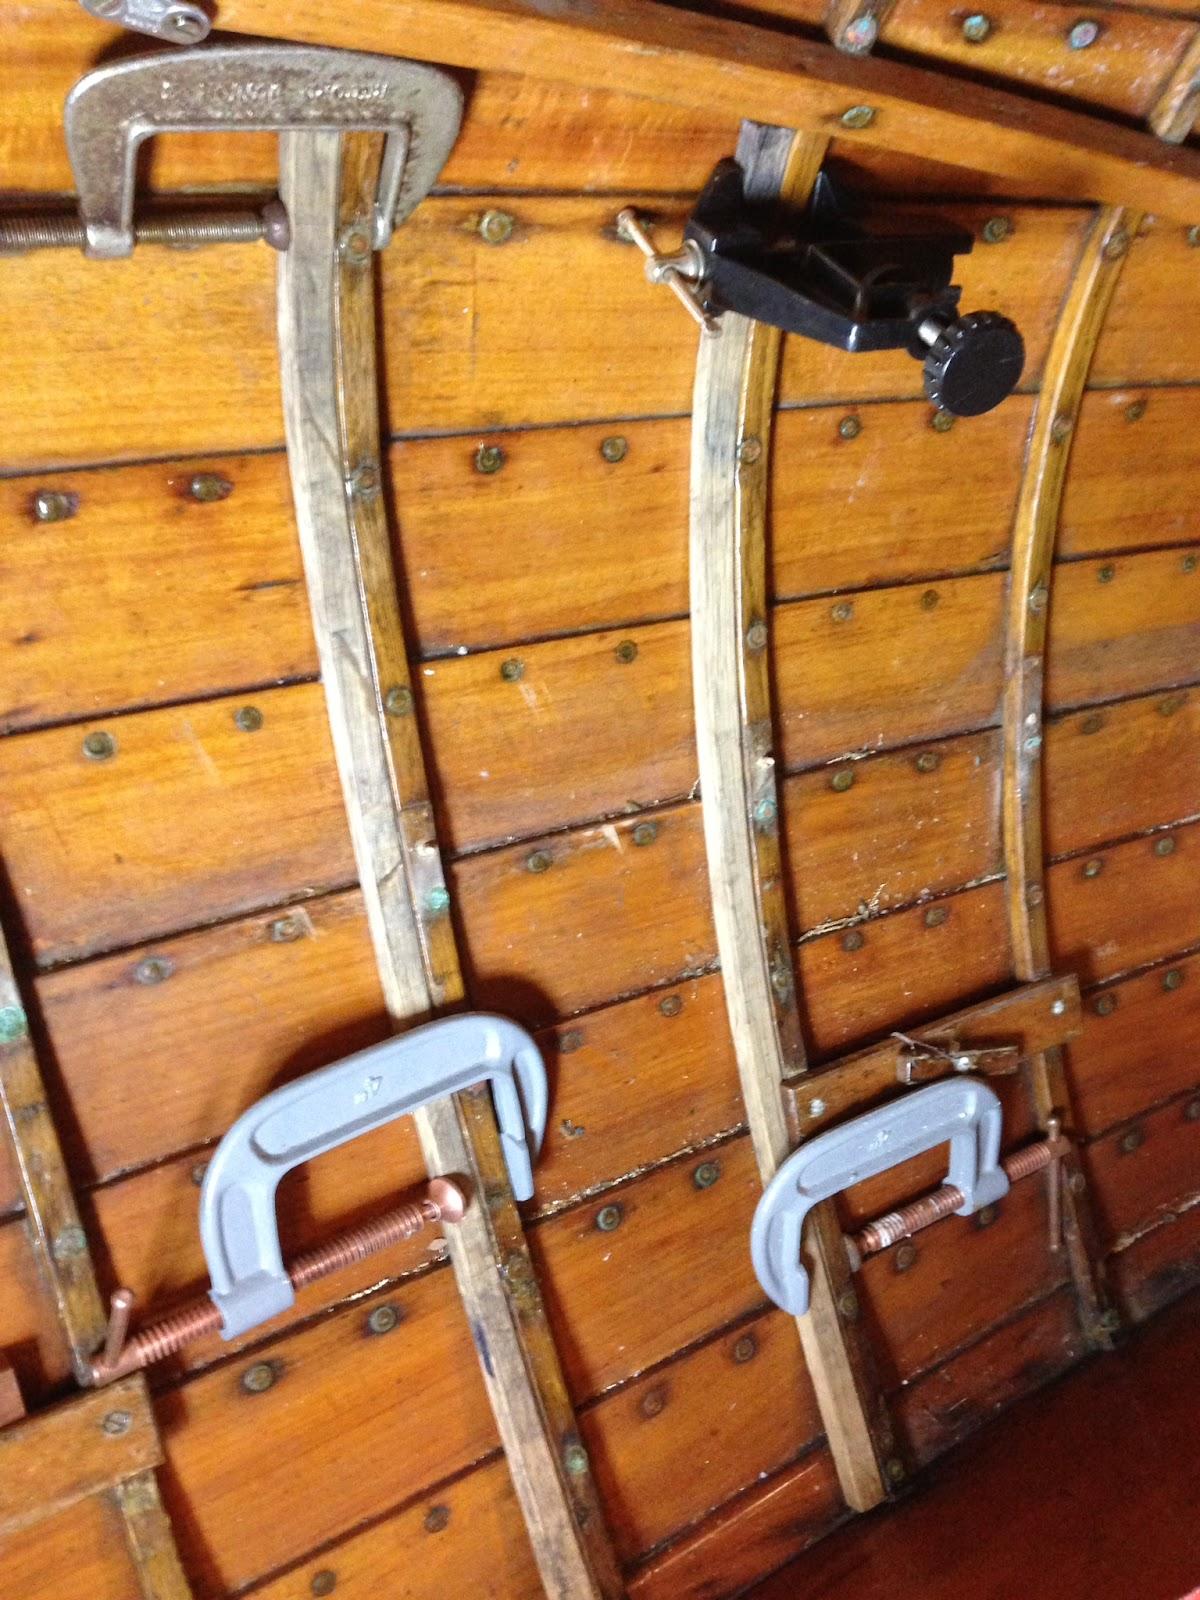 Small Clinker Boat Restoration: Repairing Redwing frames, ribs